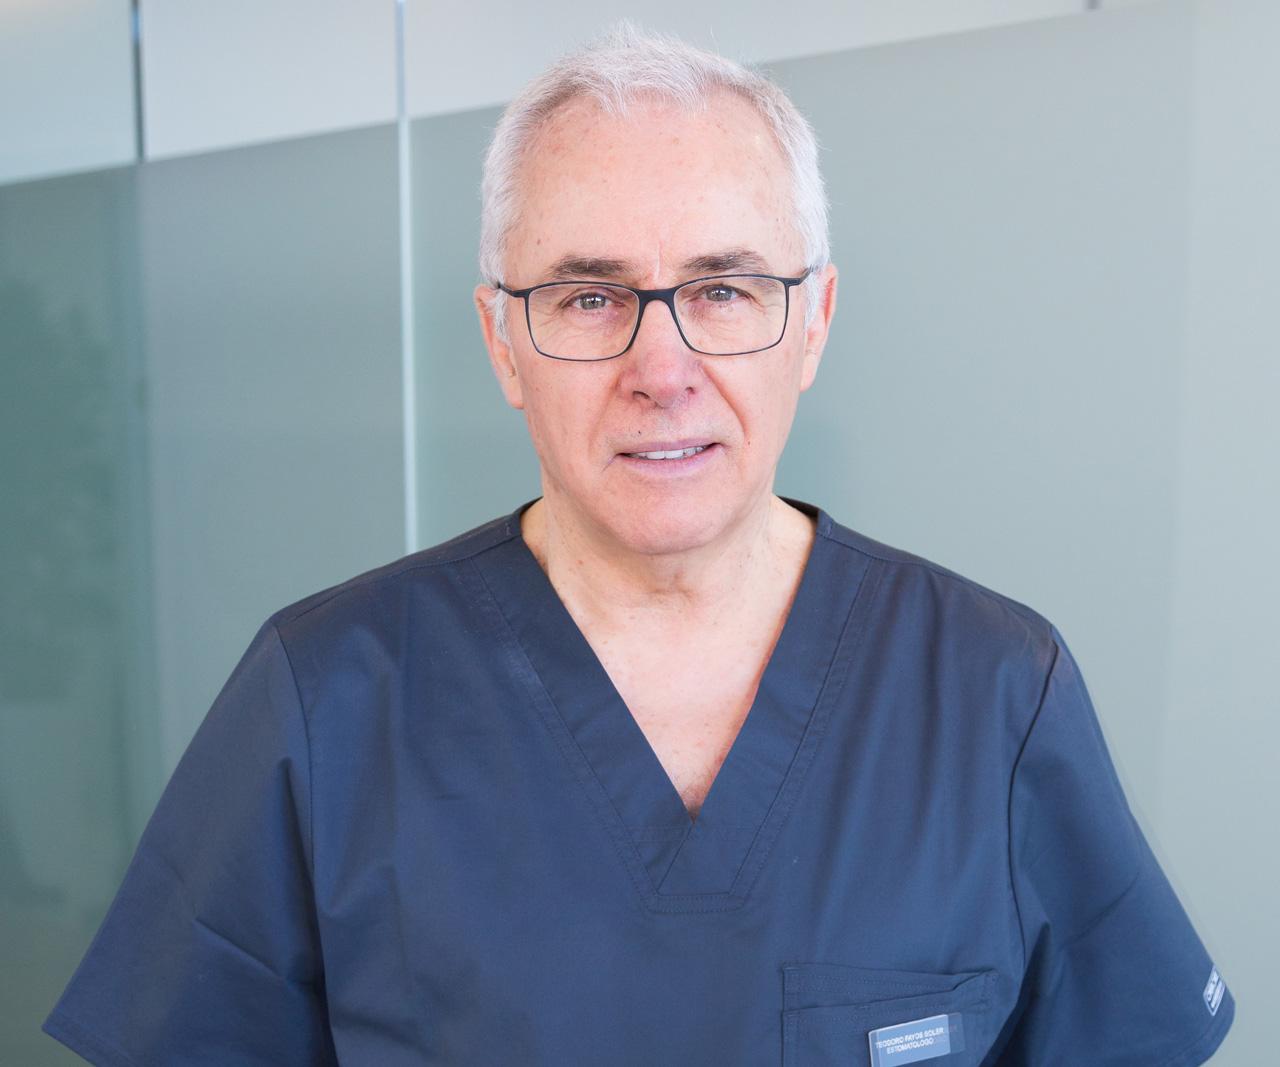 Entrevista Dr. Teodoro Fayos sobre endodoncia